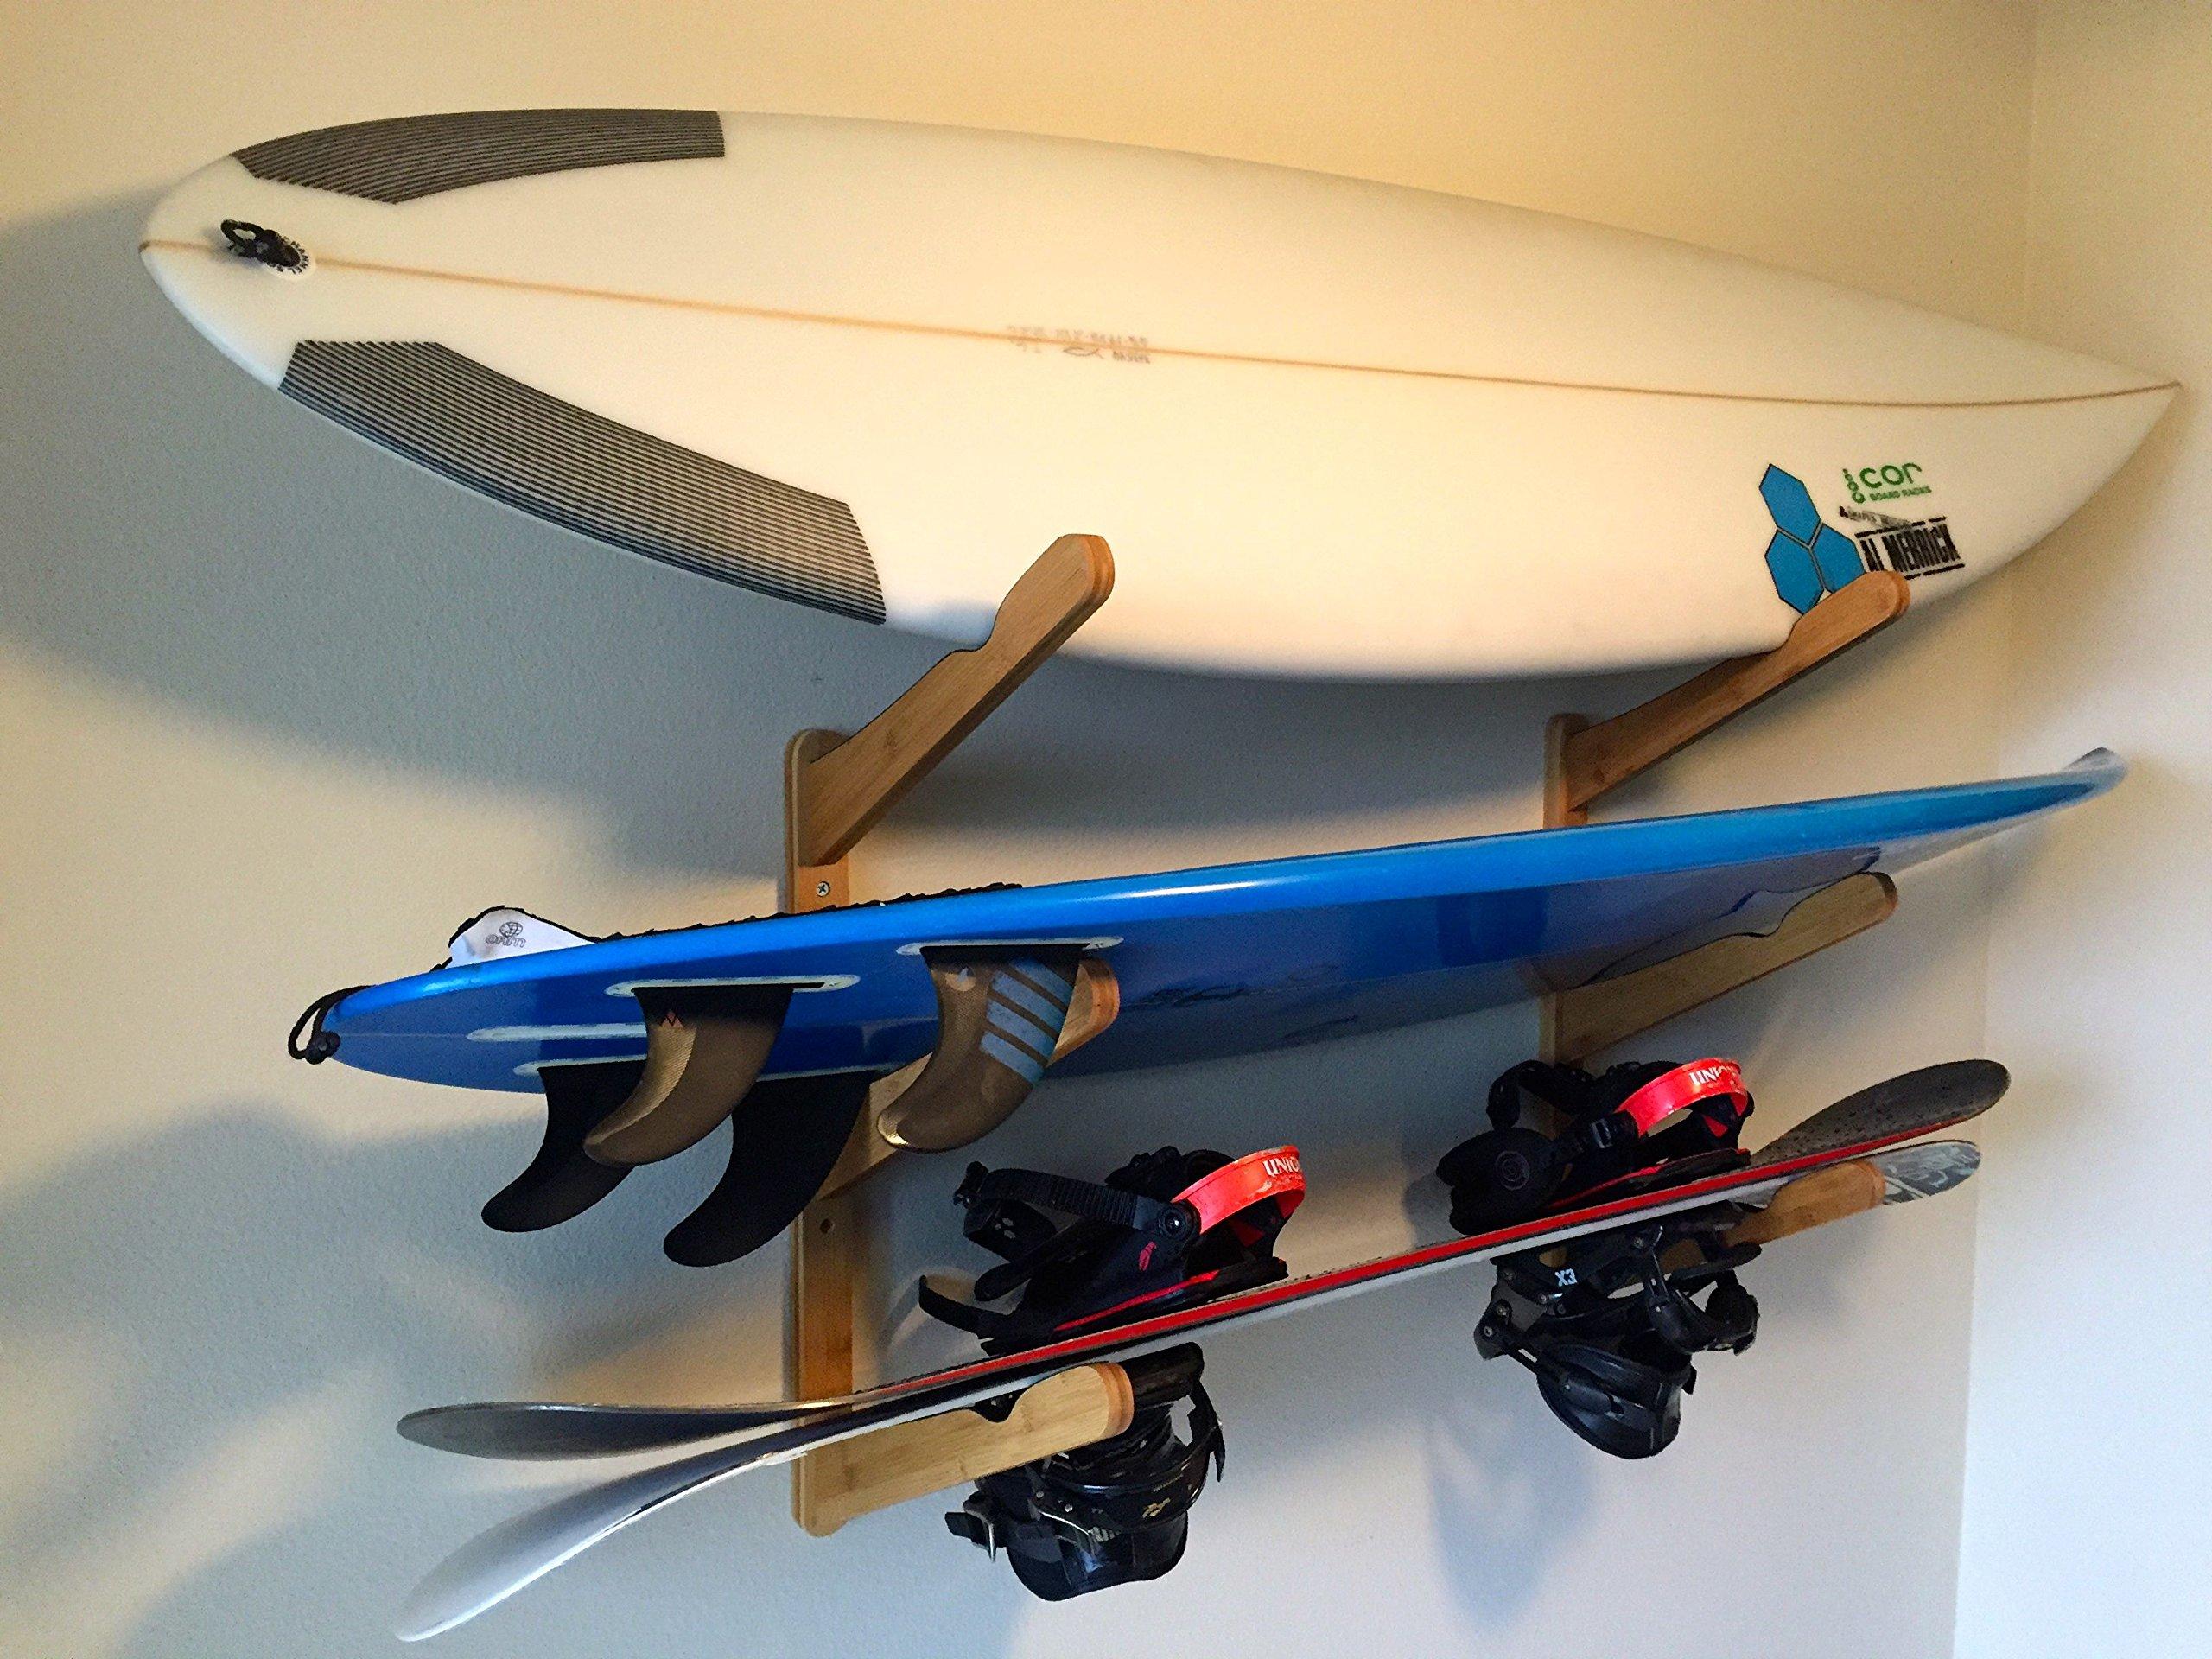 gun storage wall gregallum australia vintage hawaiian curve surfboard olo longboard krack products rack brunette sup